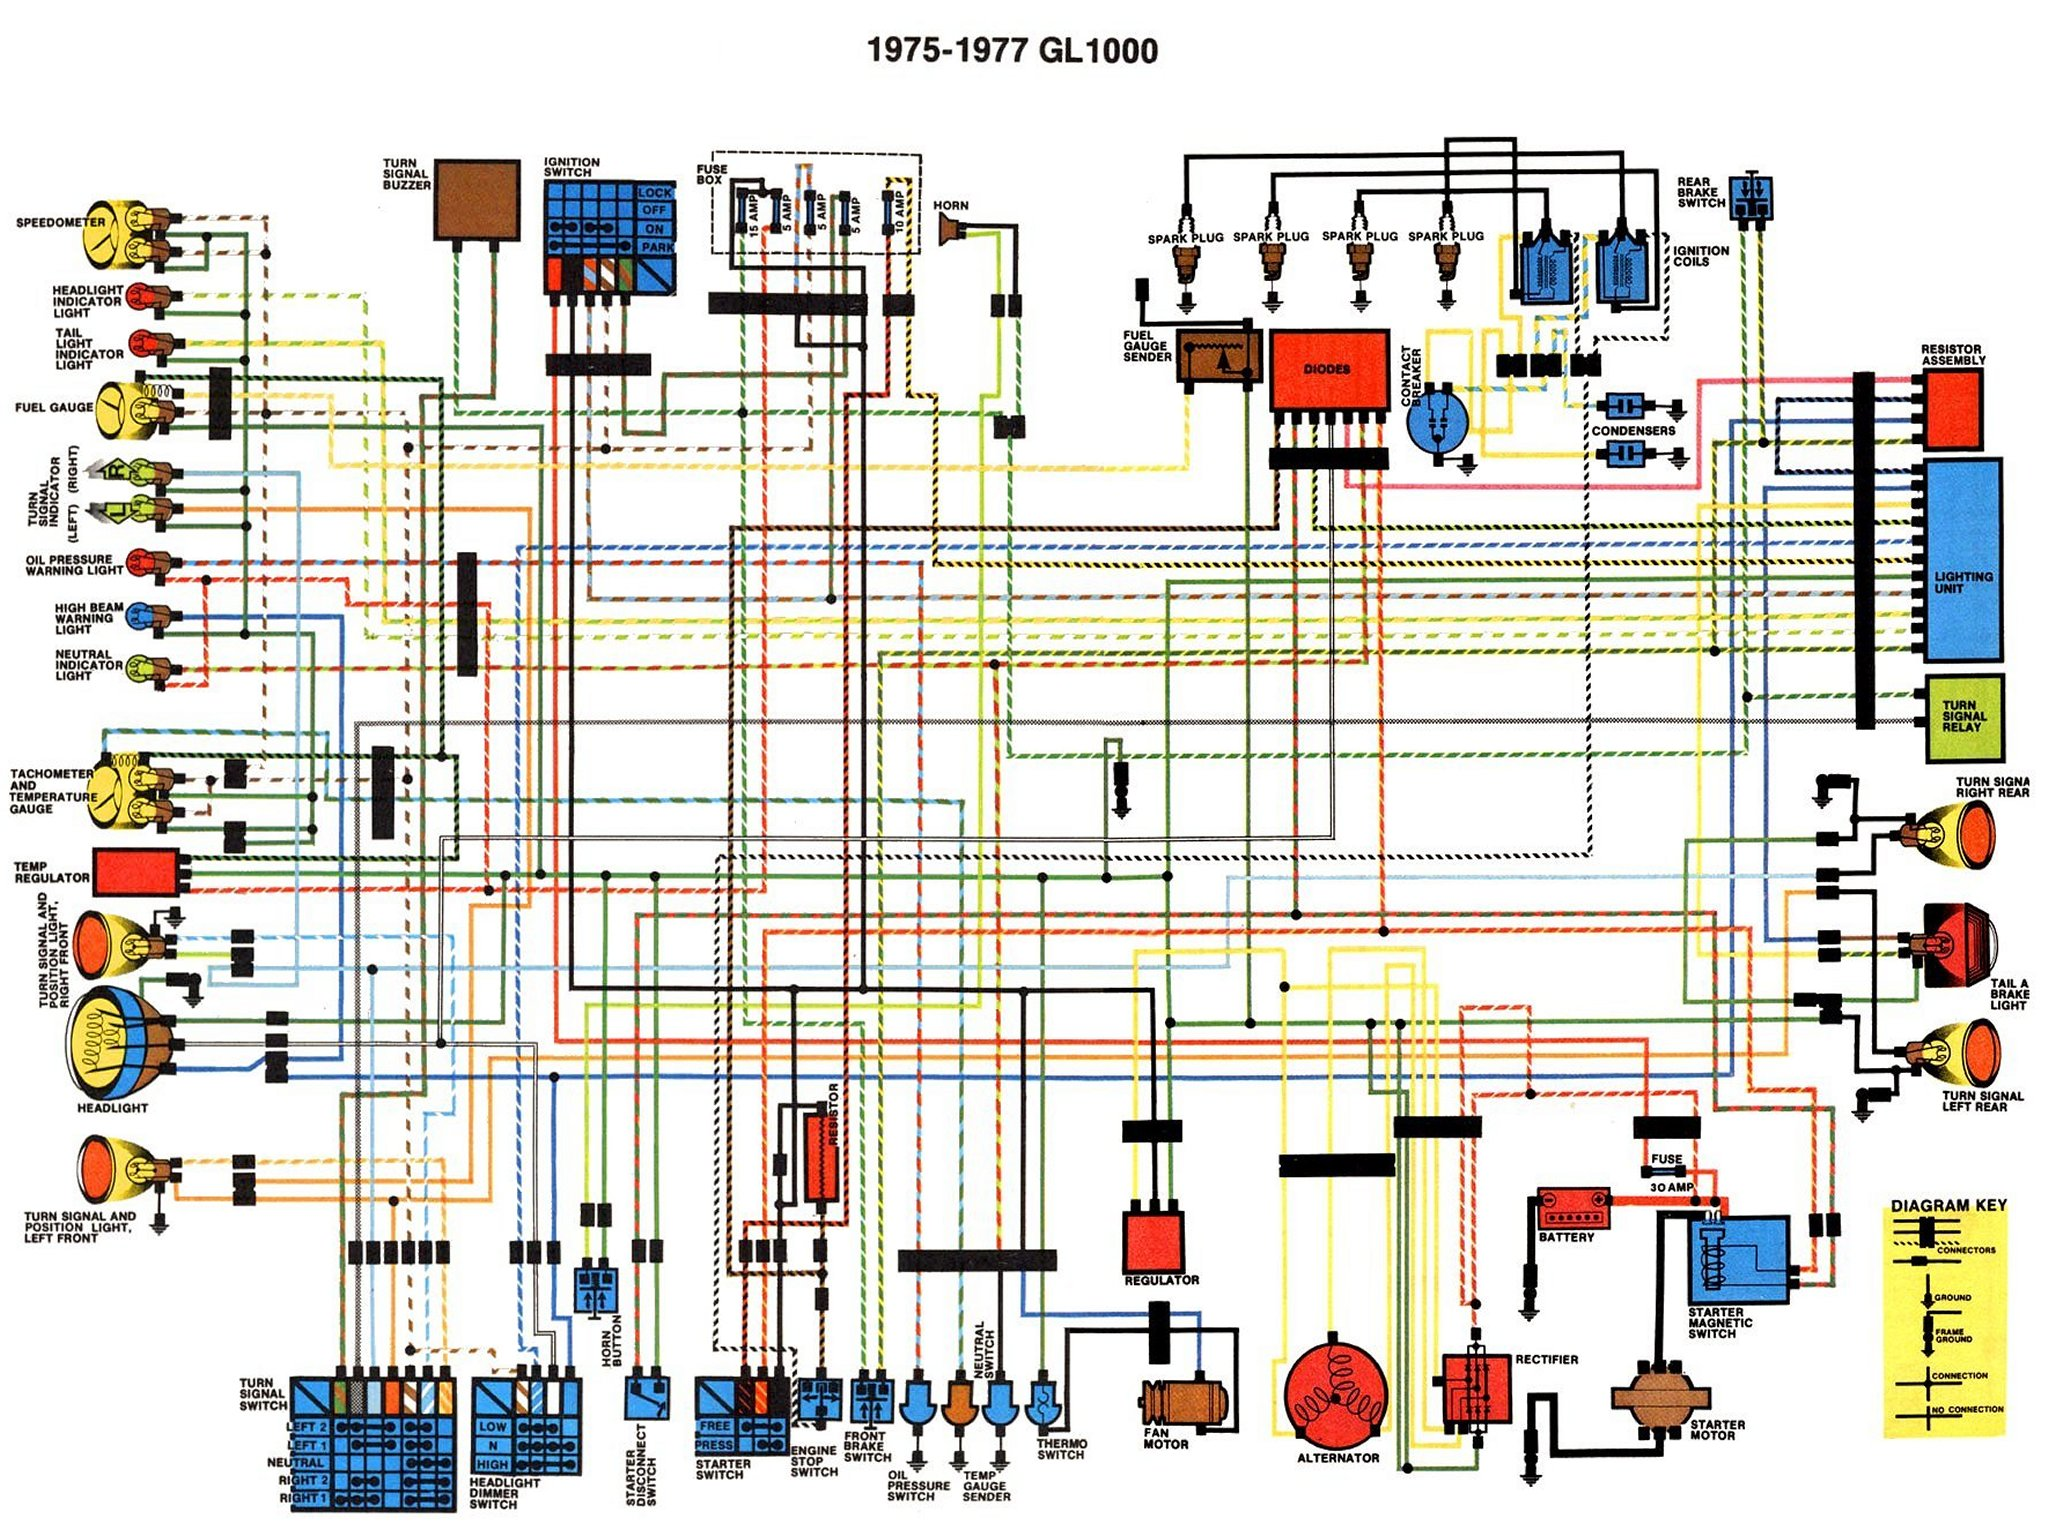 Directory Listing Of Pub Moto Gl 1979 Wiring Diagram In Pdf Wiringschema 09 Jan 2013 822 870k Gl1000batessaddlebagmountinginstructionspdf 12 1706 76m Gl1000gl11001975 1983 Servicemanualpdf